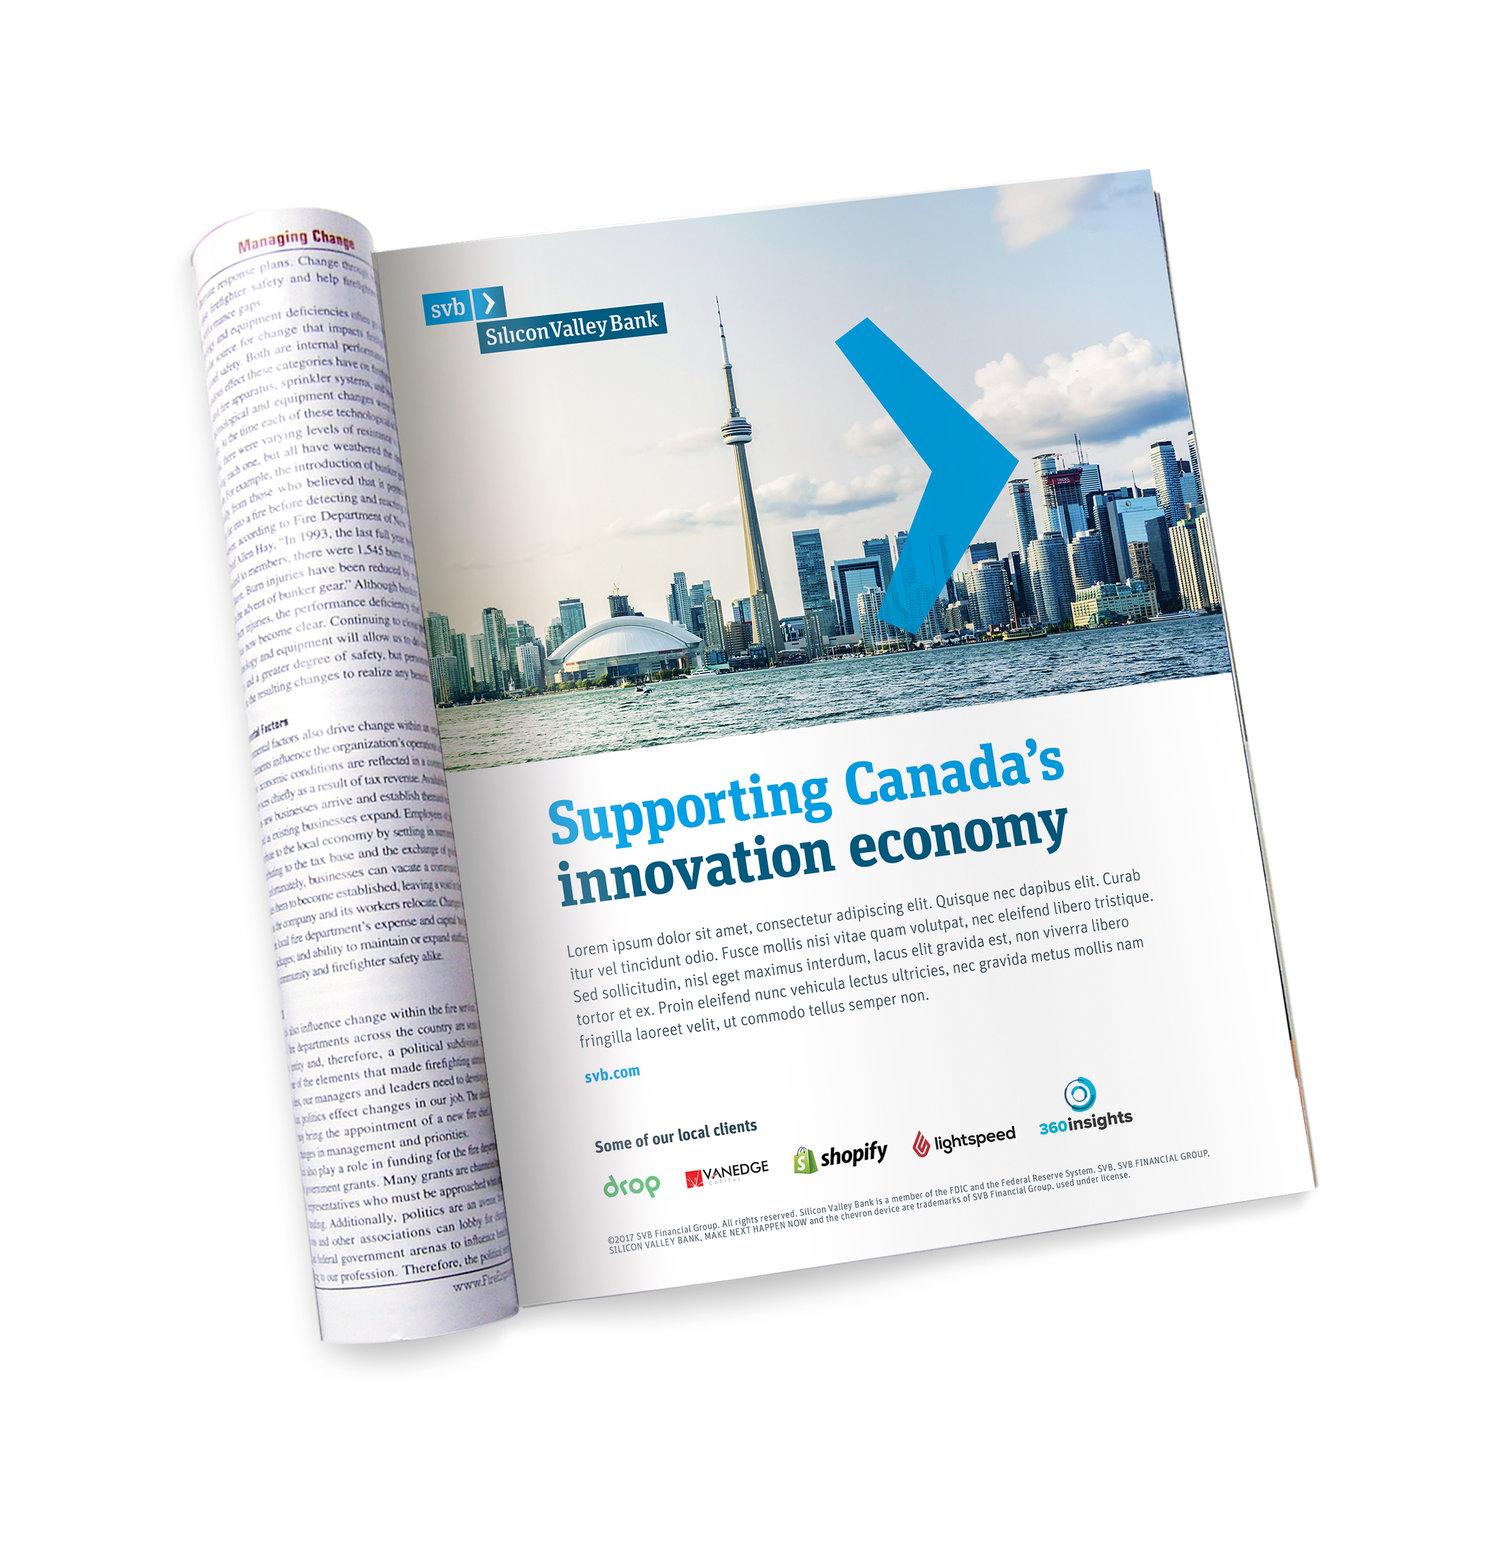 SVB_Canada_Ad_Mockup_v2.jpg